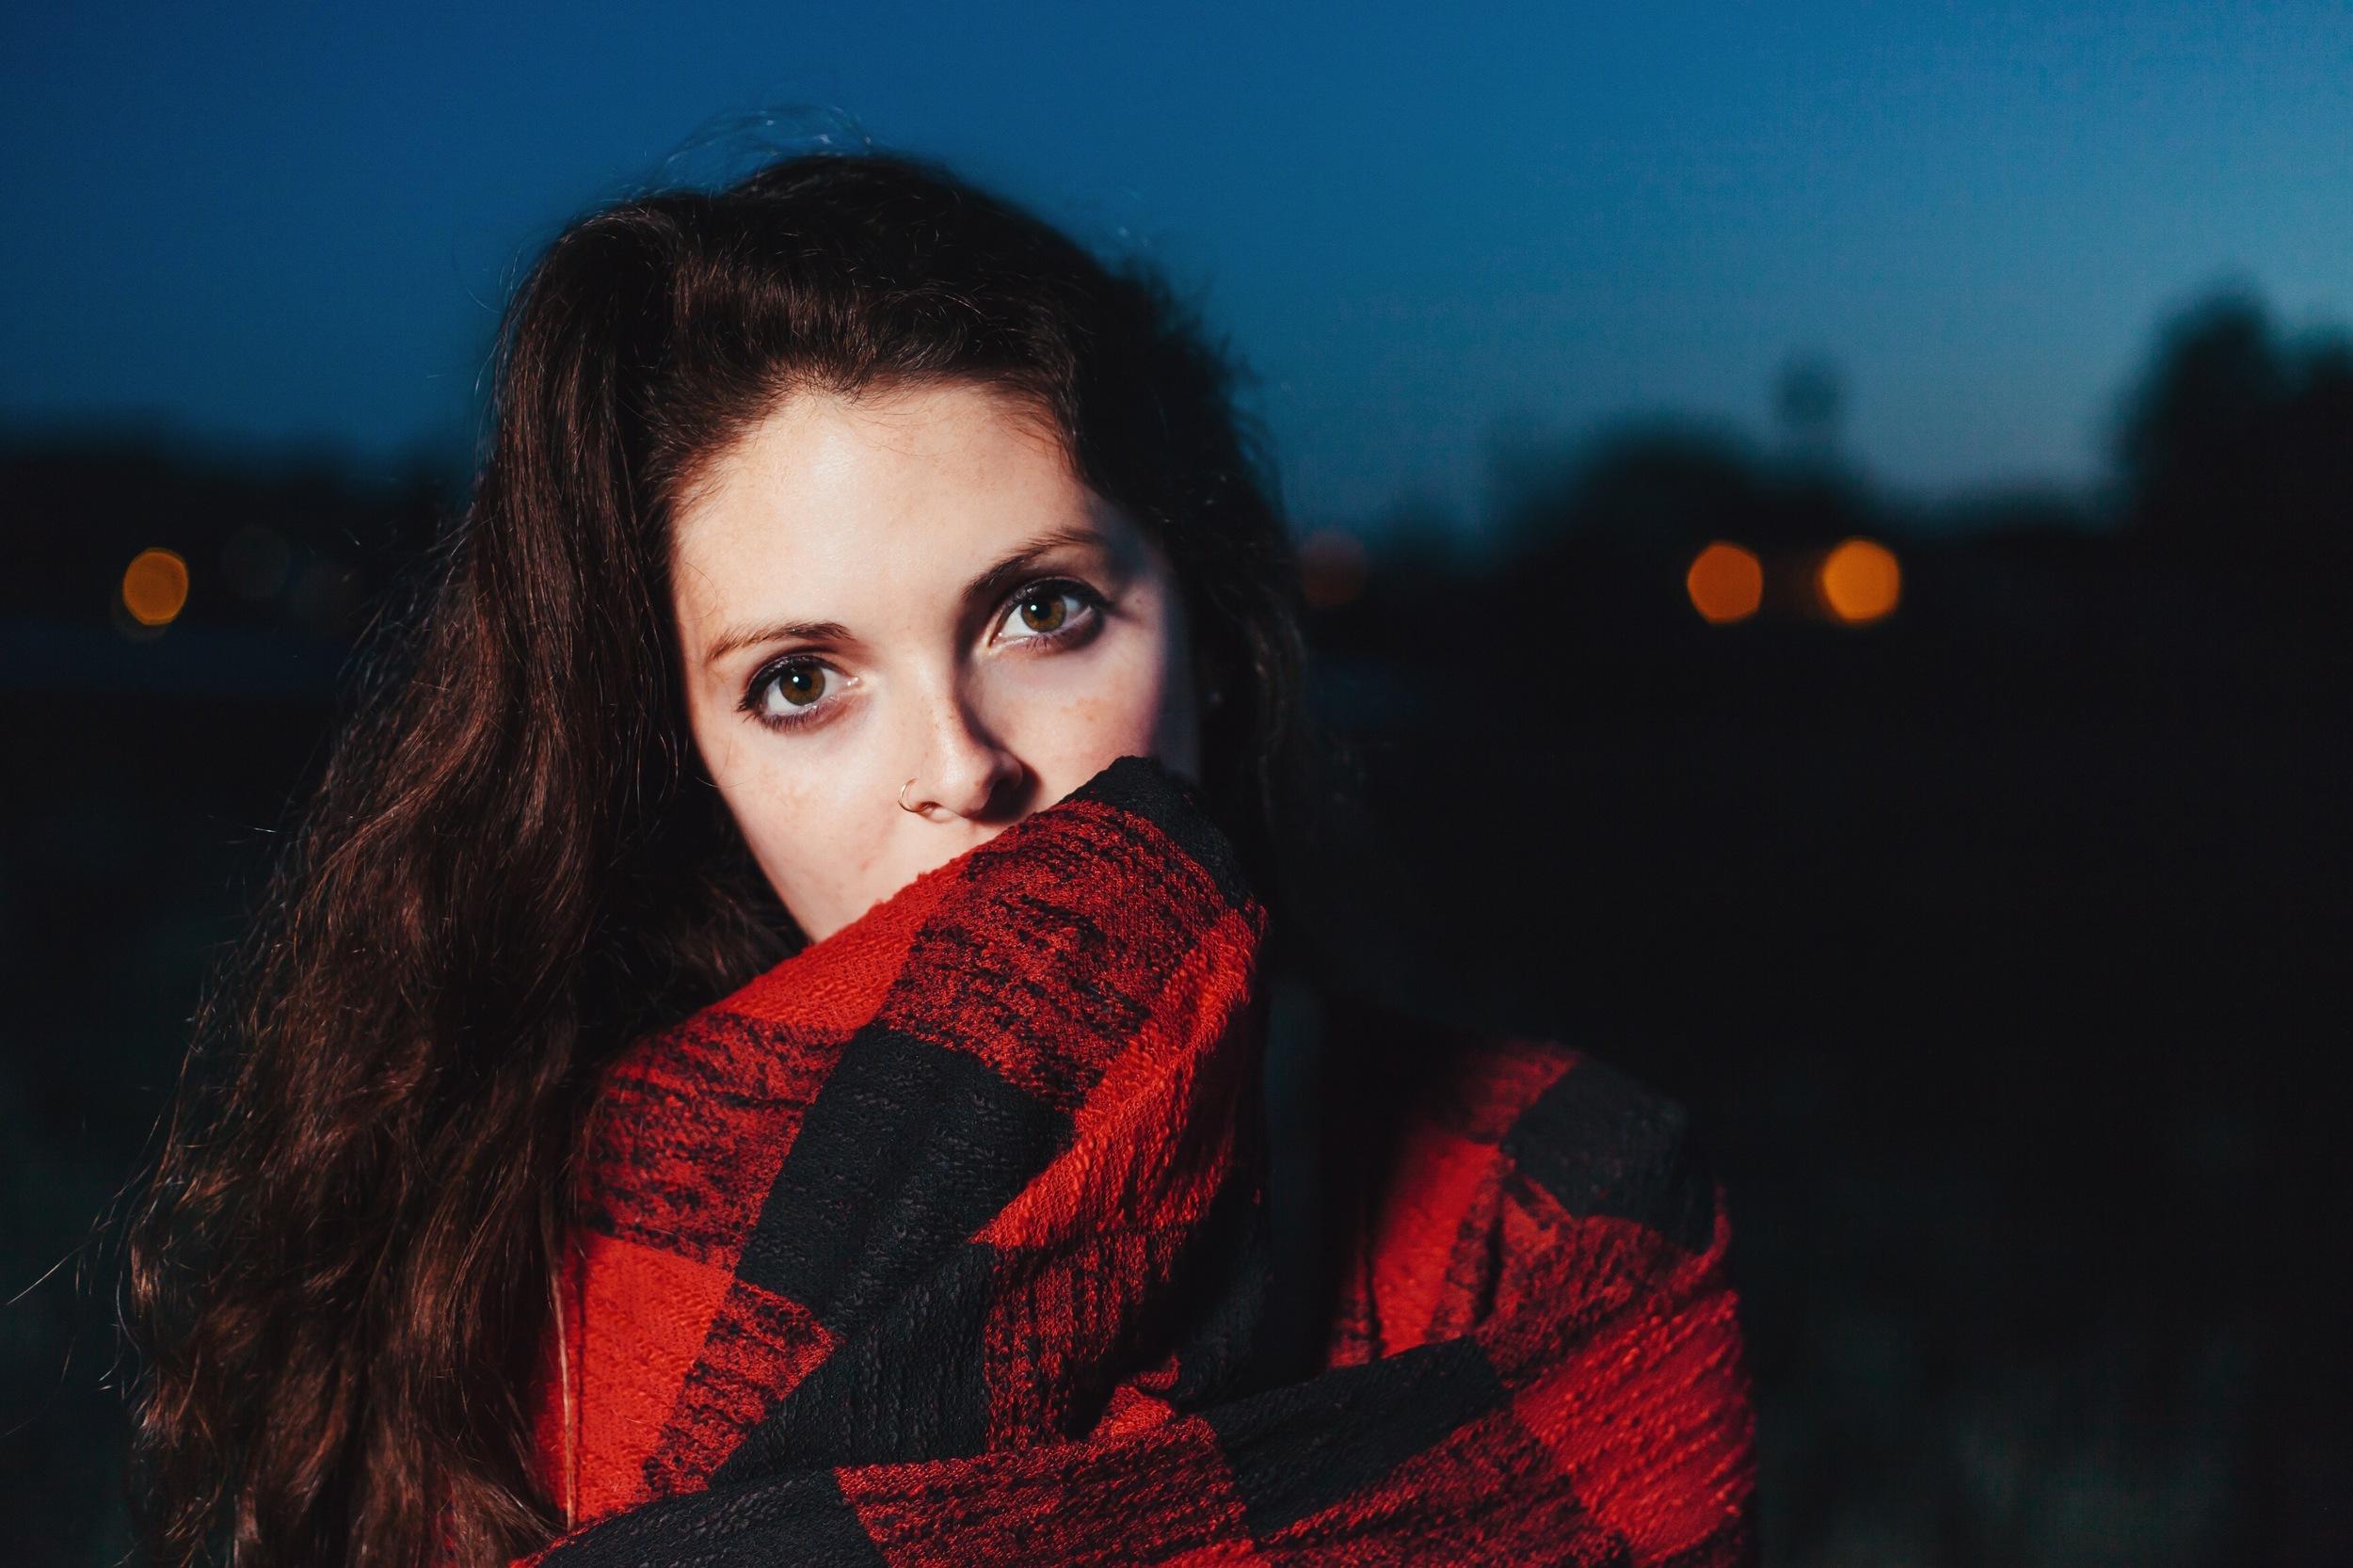 Flannel-blanket-wrapped-brunette-dusk